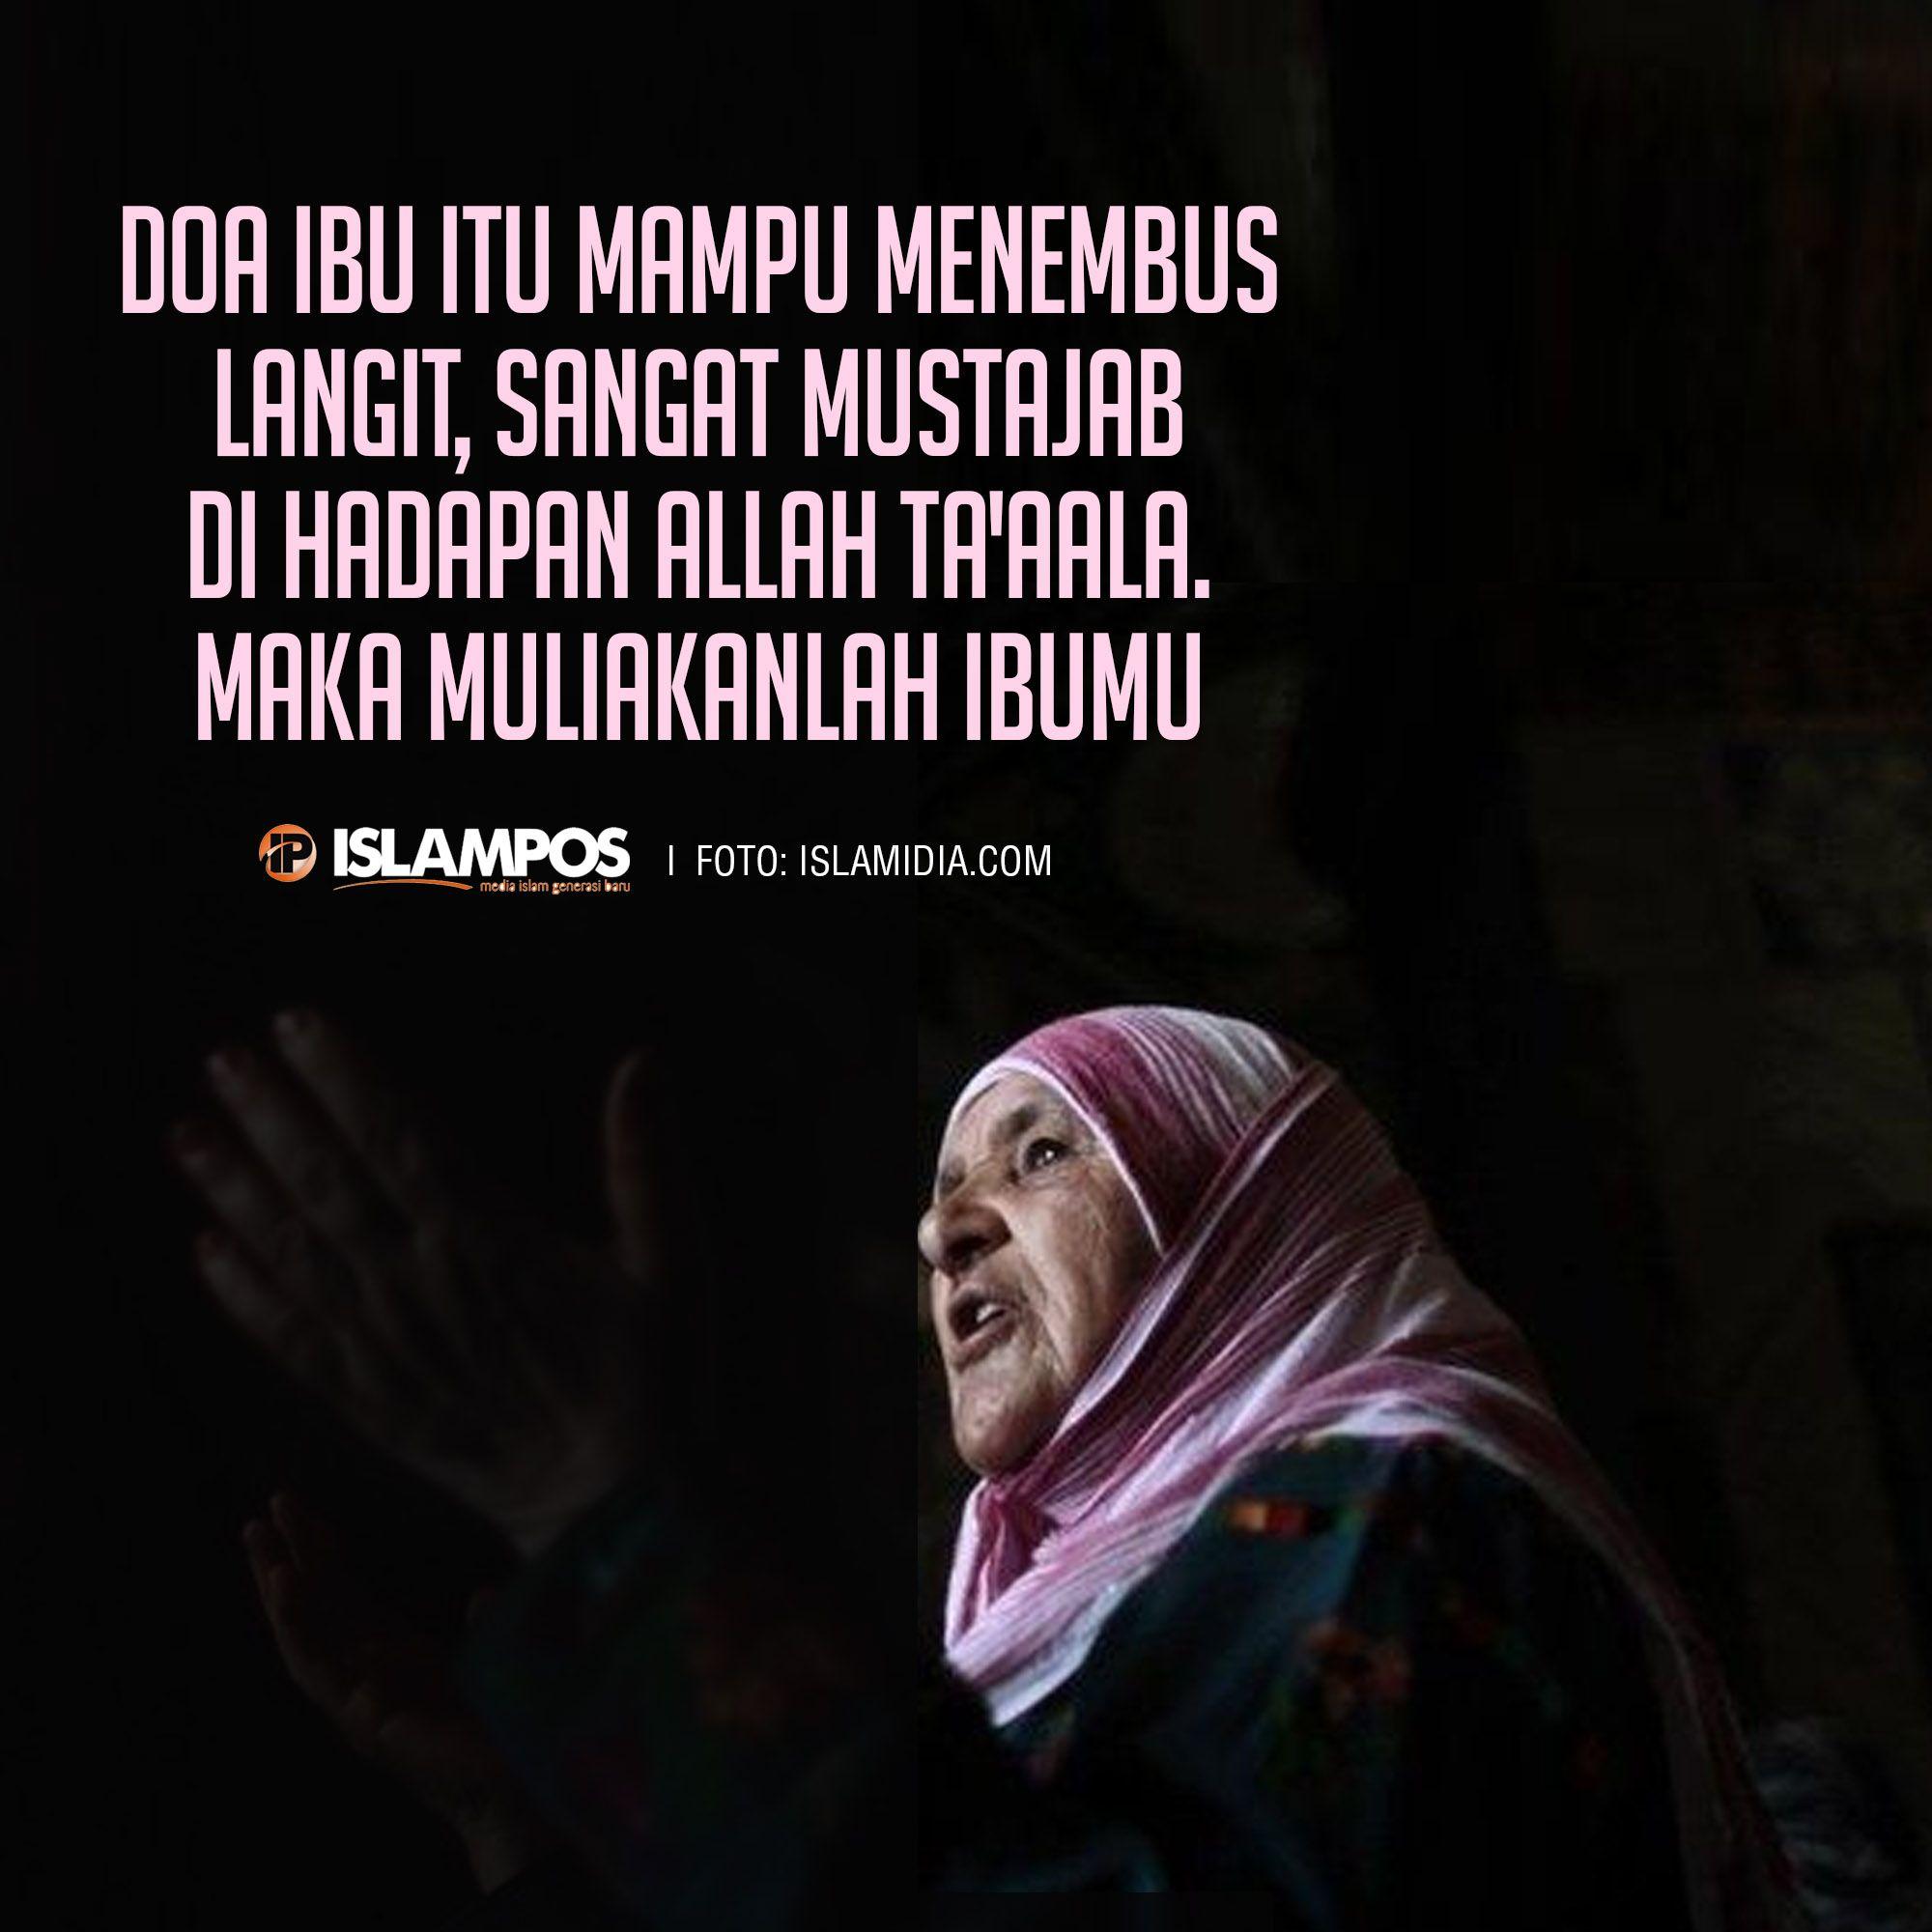 Doa Ibu Itu Mampu Menembus Langit Kutipan Tentang Kehidupan